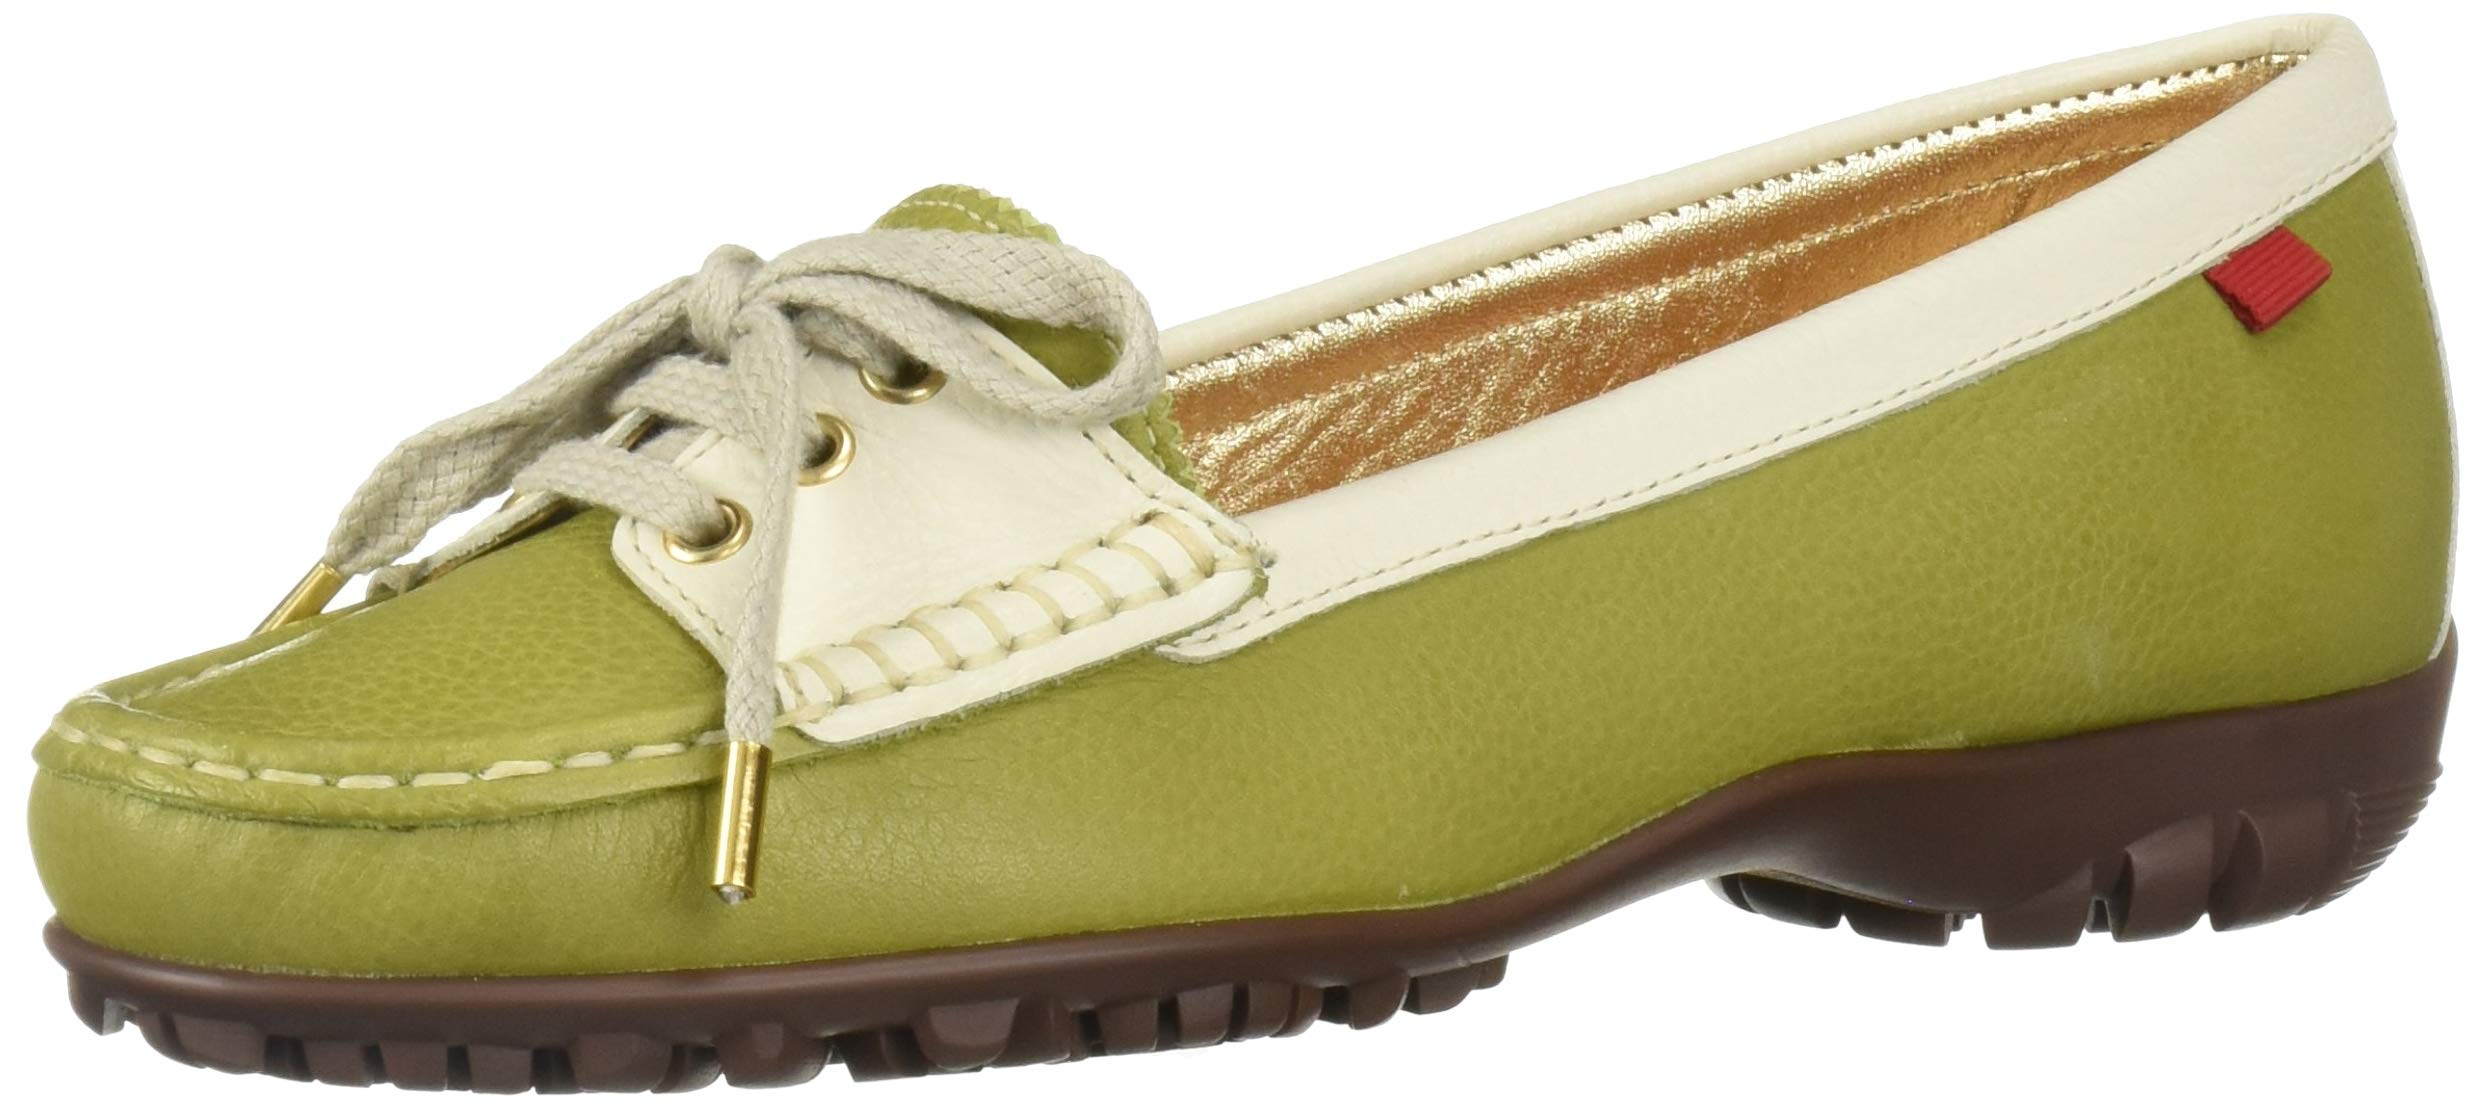 MARC JOSEPH NEW YORK Womens Leather Made in Brazil Liberty Golf Shoe, Apple Grainy, 8.5 M US by MARC JOSEPH NEW YORK